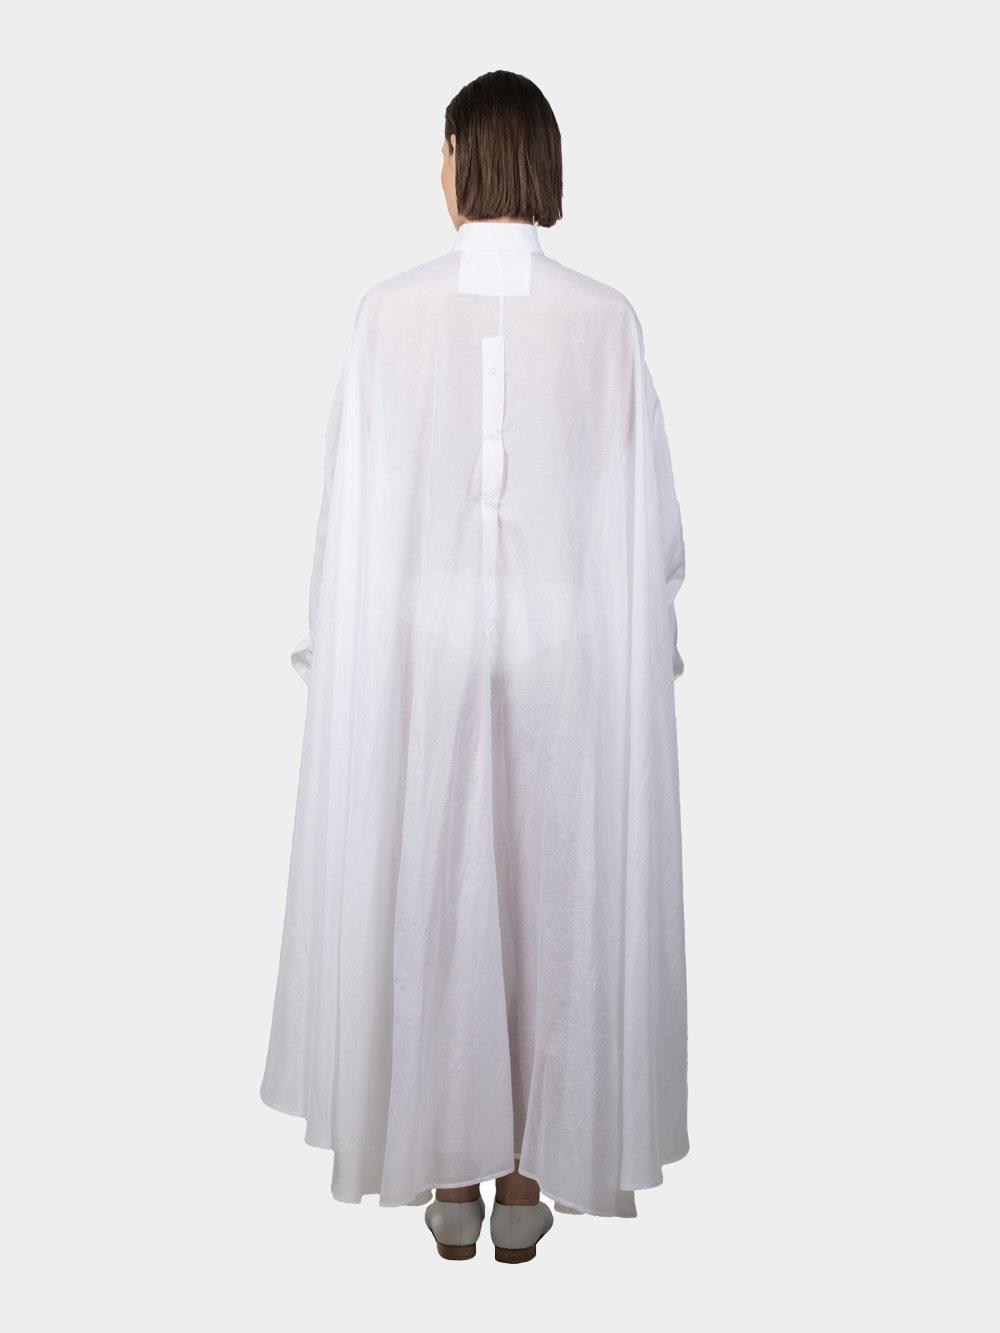 Ludus Transparent Medusae Shirt - white